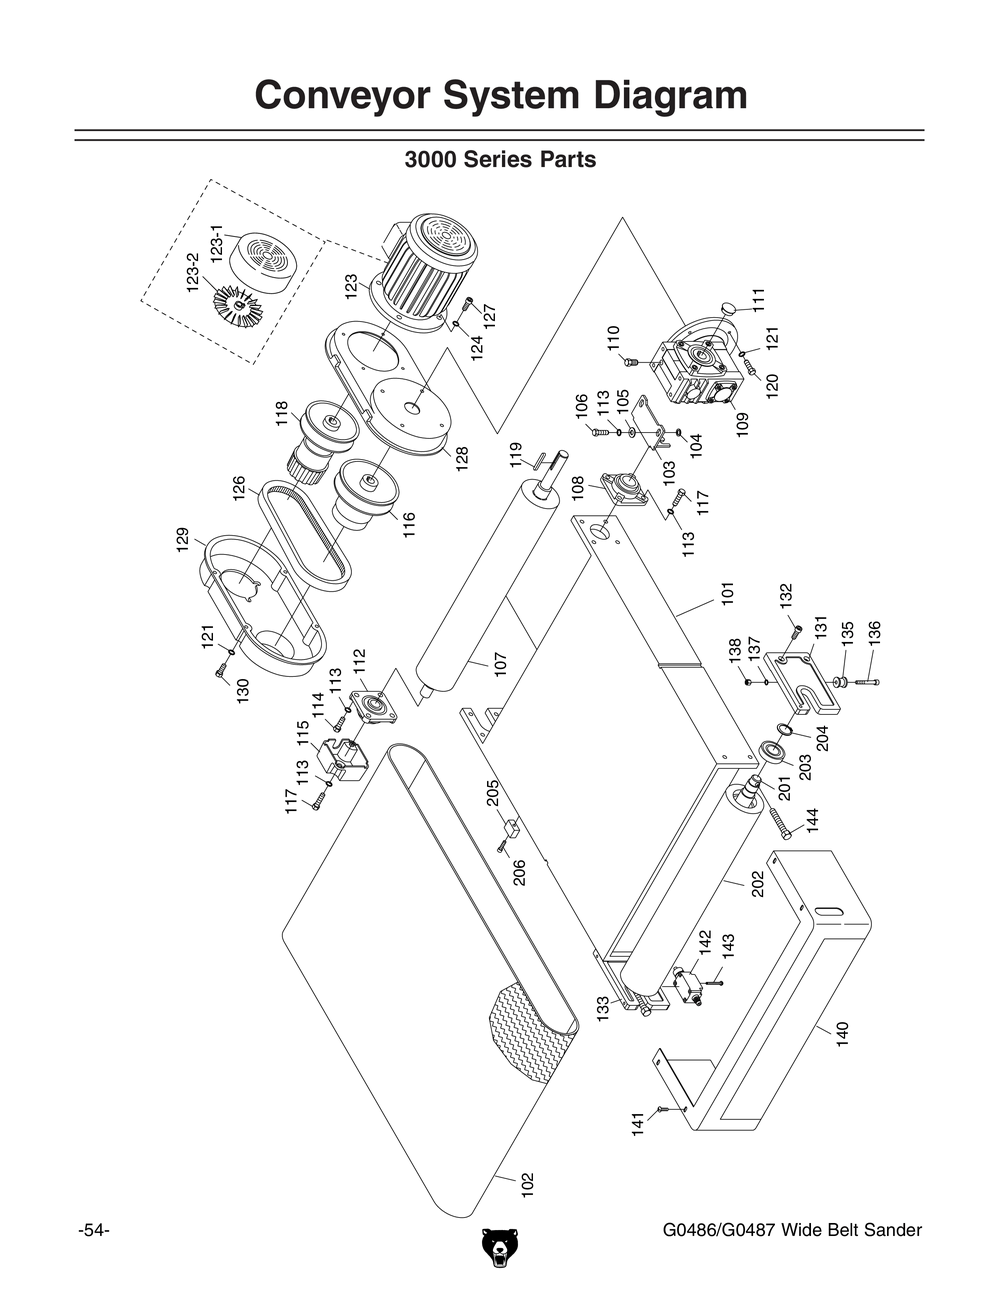 Autometer phantom 2 pyrometer wiring diagram wiring diagram g0487 pl 12 1000 autometer phantom 2 pyrometer